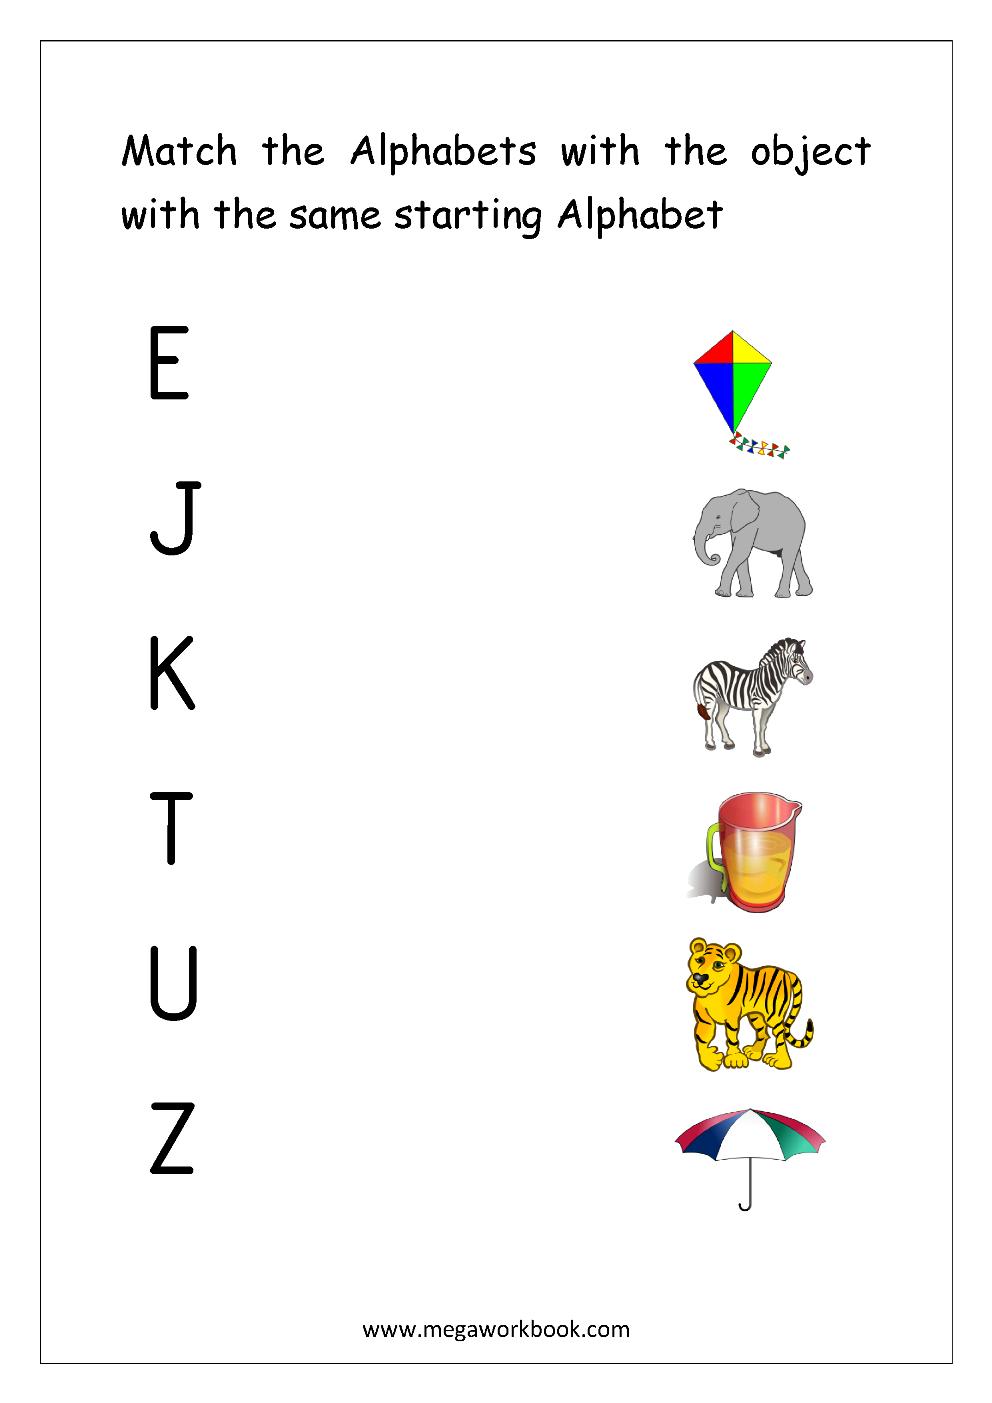 Free English Worksheets - Alphabet Matching - Megaworkbook for Alphabet Matching Worksheets For Preschoolers